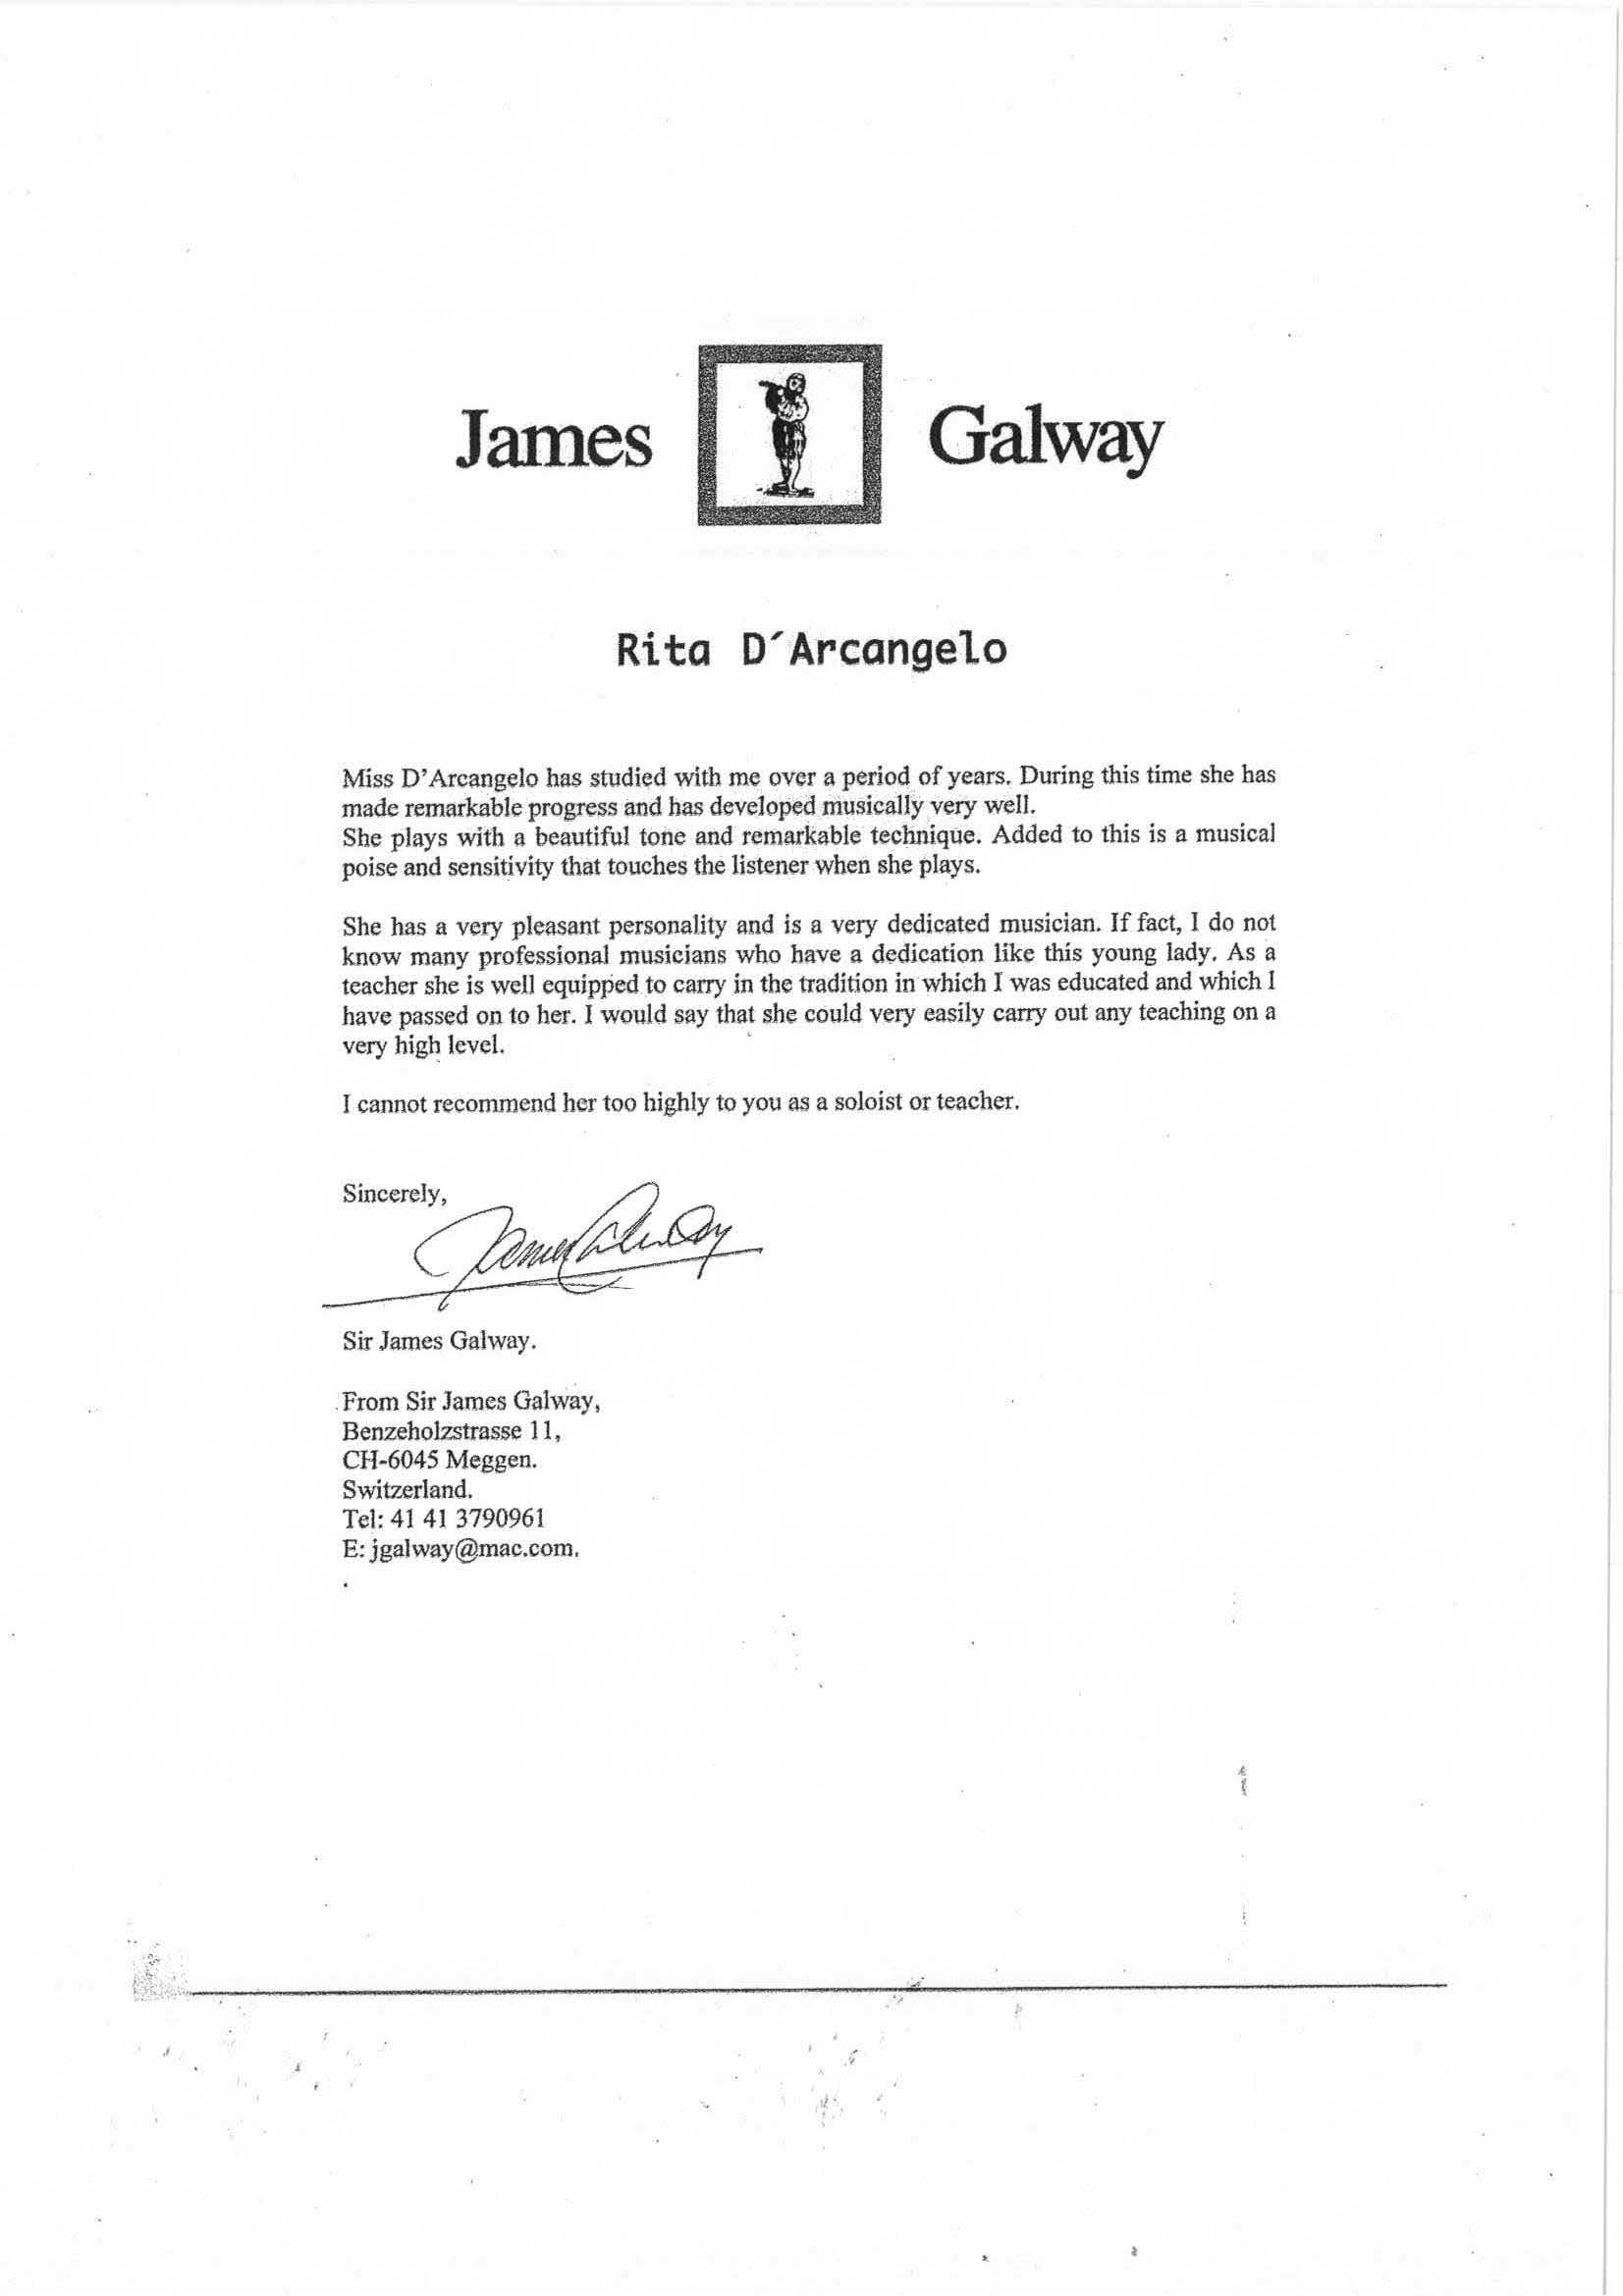 Recomendation letter James Galway for Rita D_Arcangelo.jpg